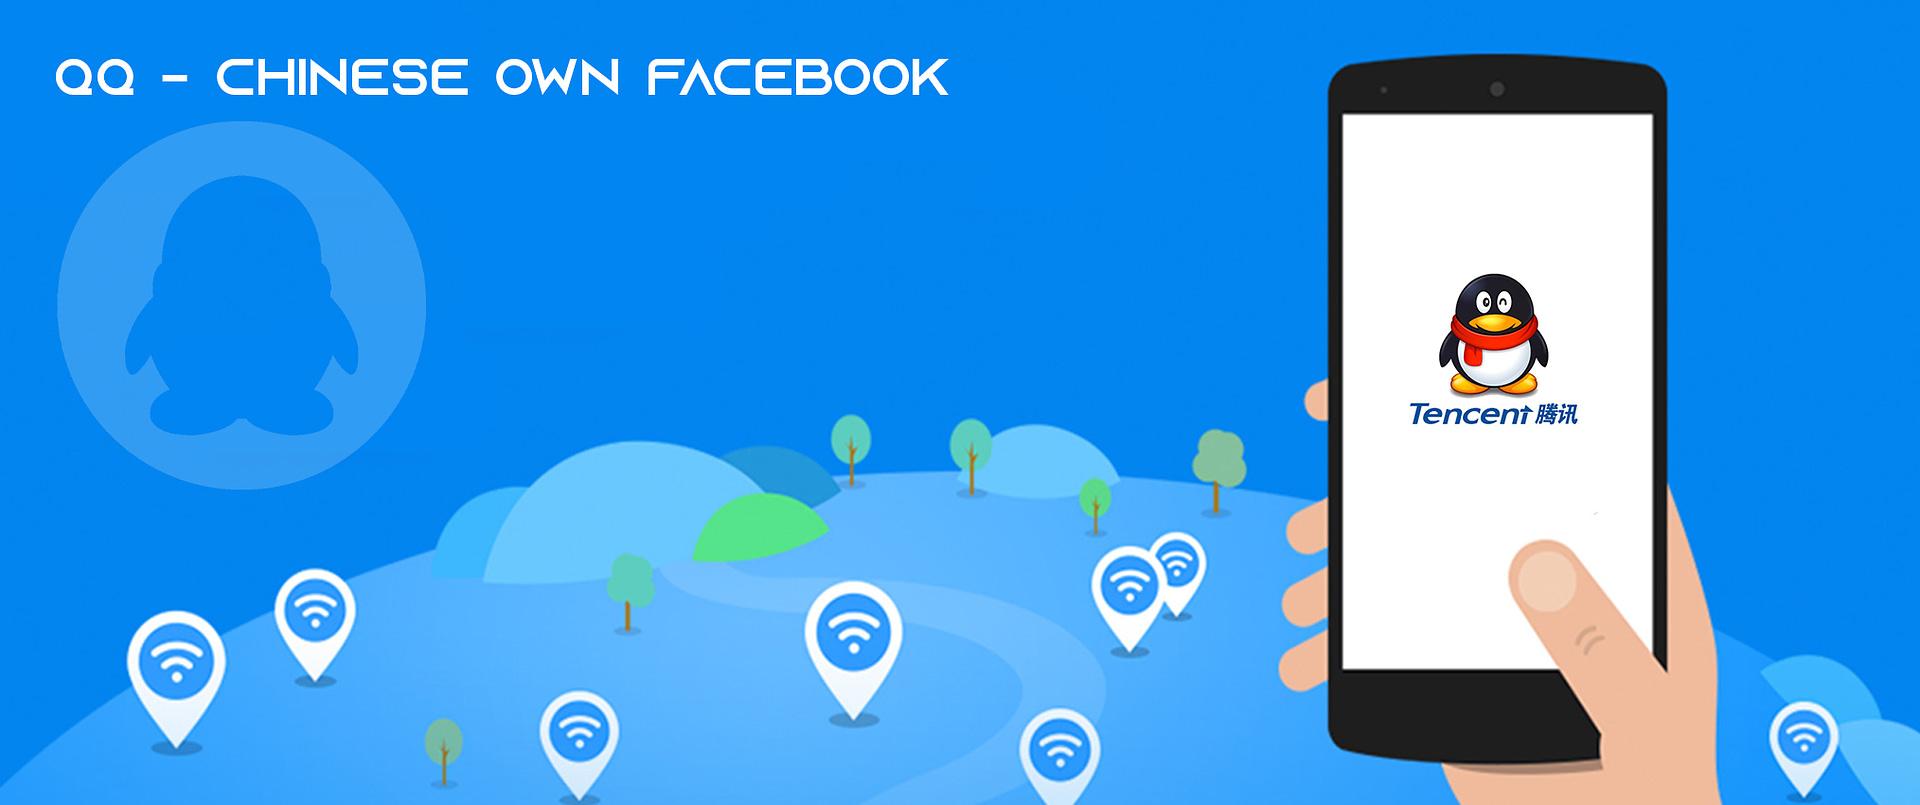 Qq Tencent Qq Chinese Own Facebook Techiitalks